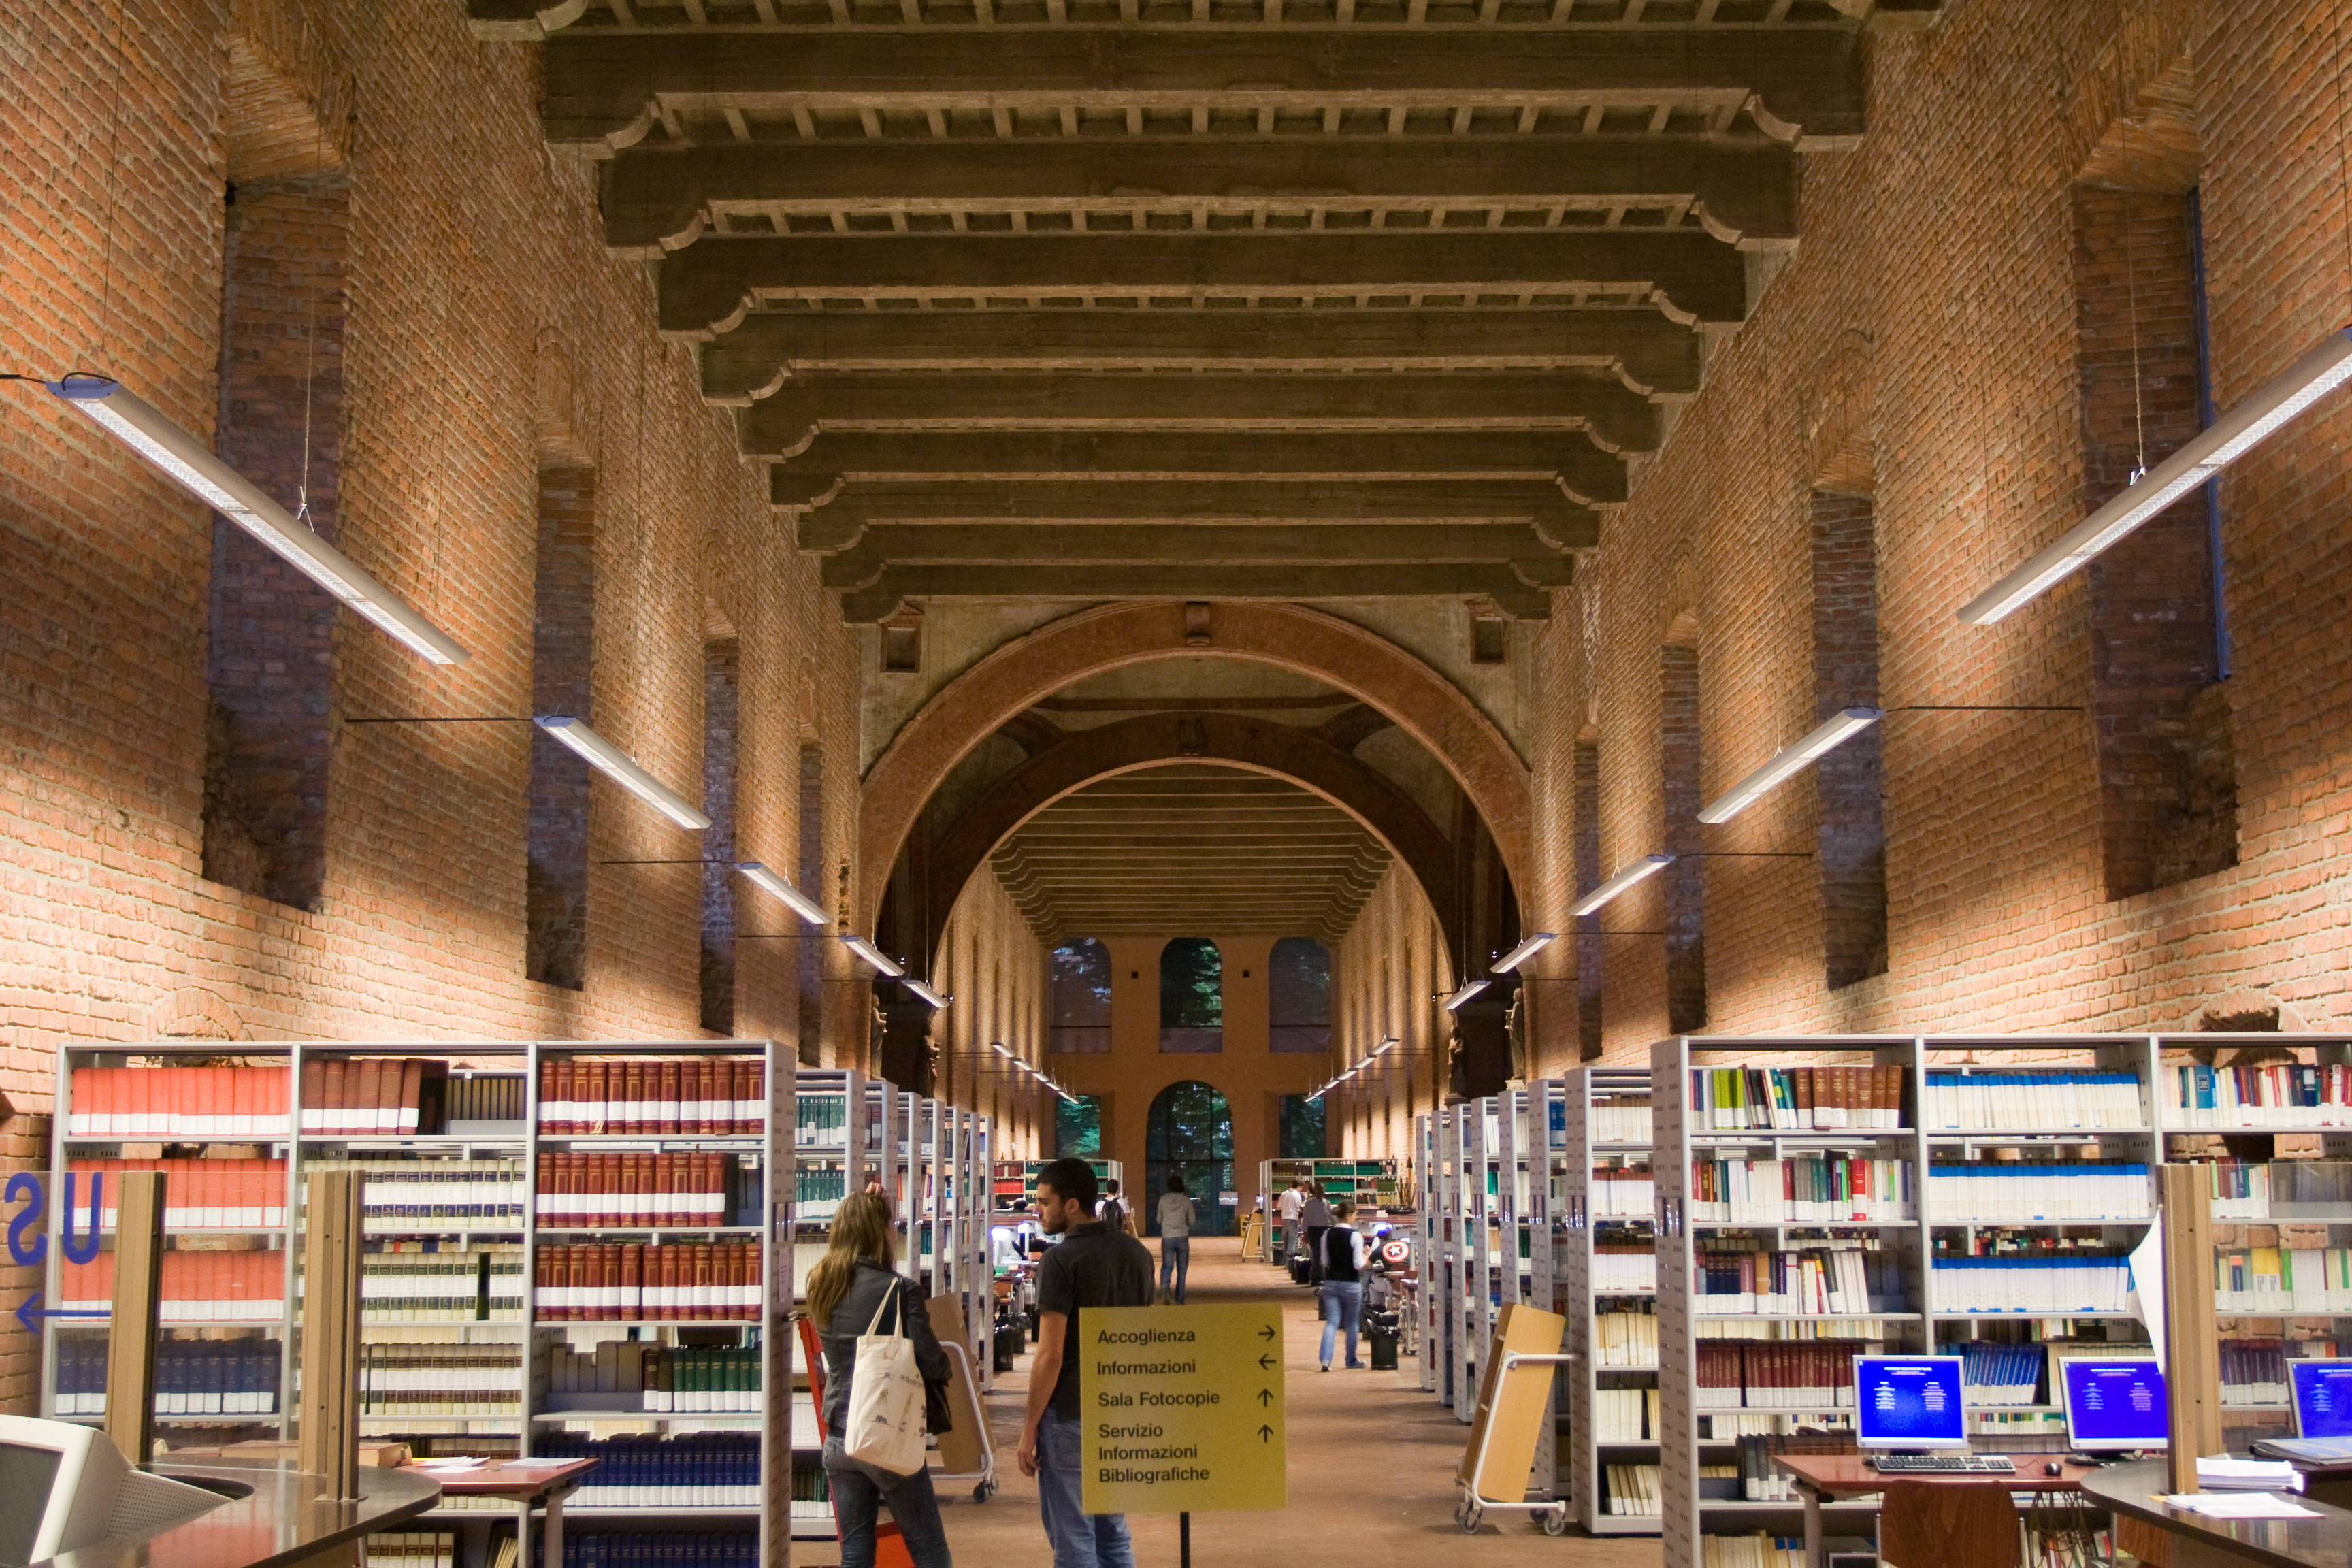 File Sala Crociera Universit 224 Degli Studi Di Milano Jpg